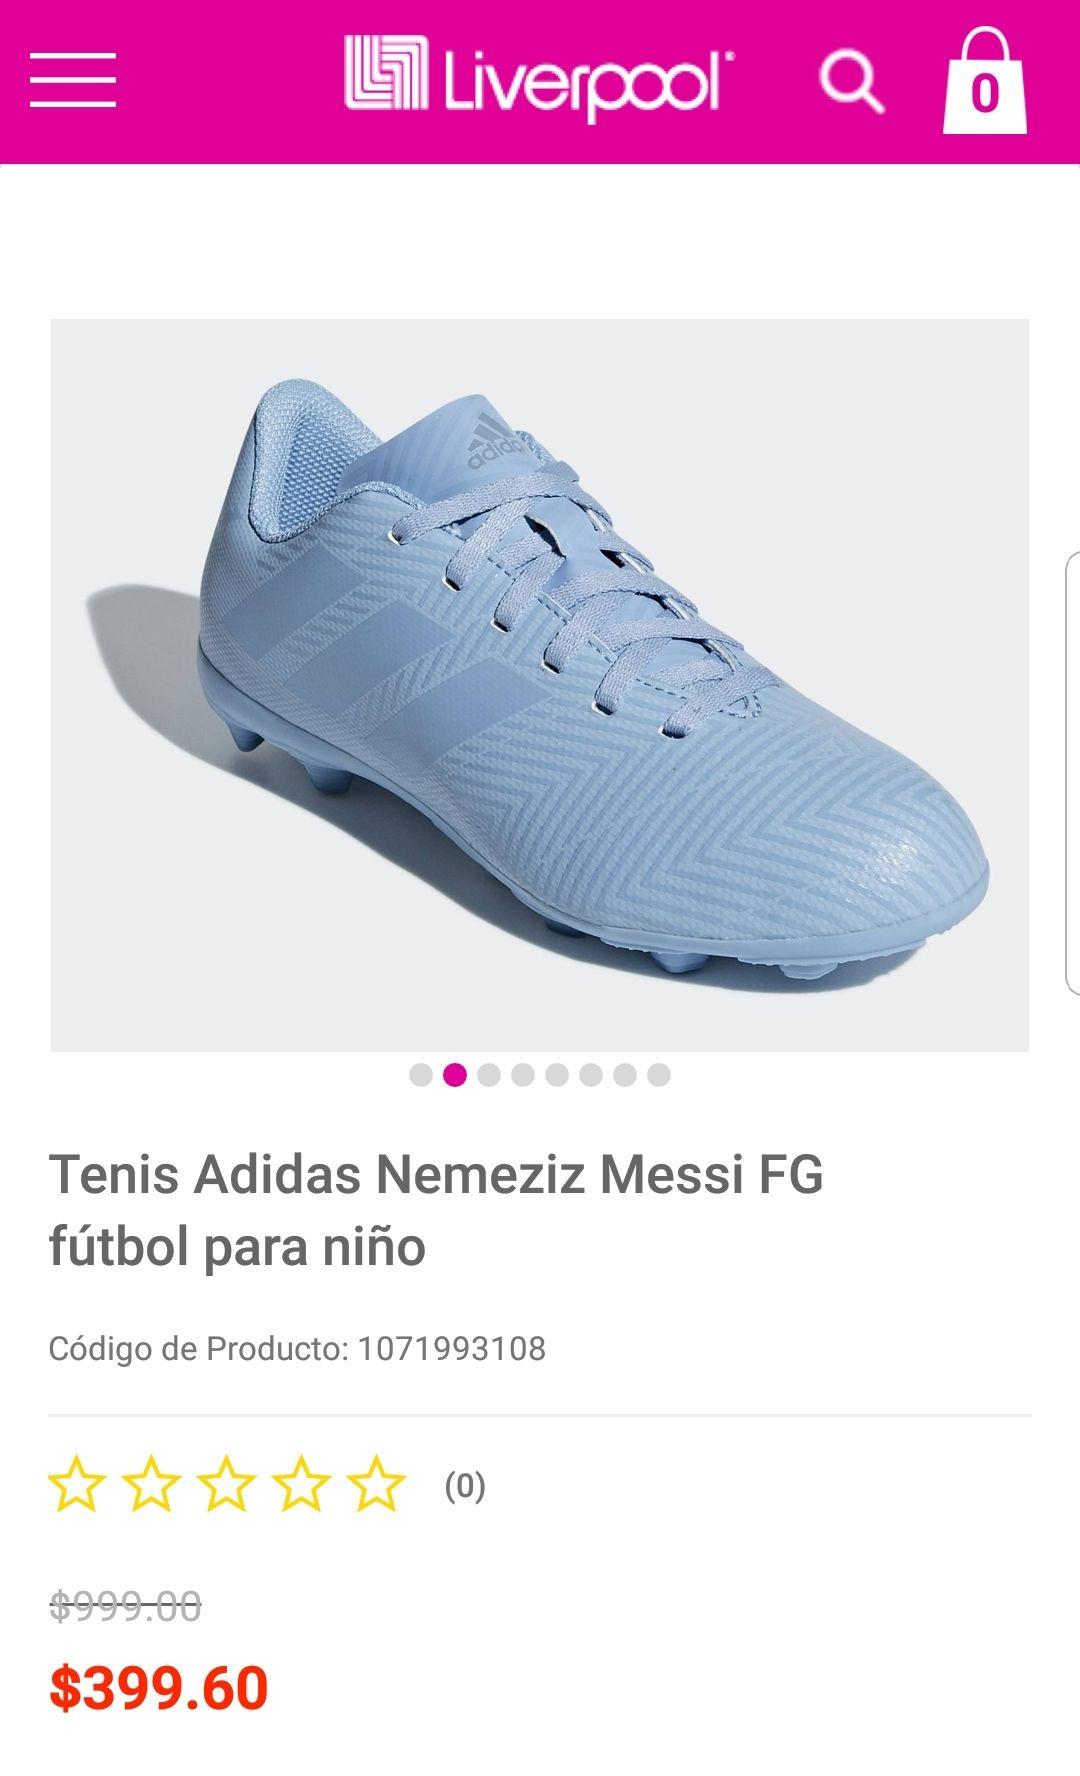 Liverpool: Tenis Adidas Nemeziz FG PARA NIÑO